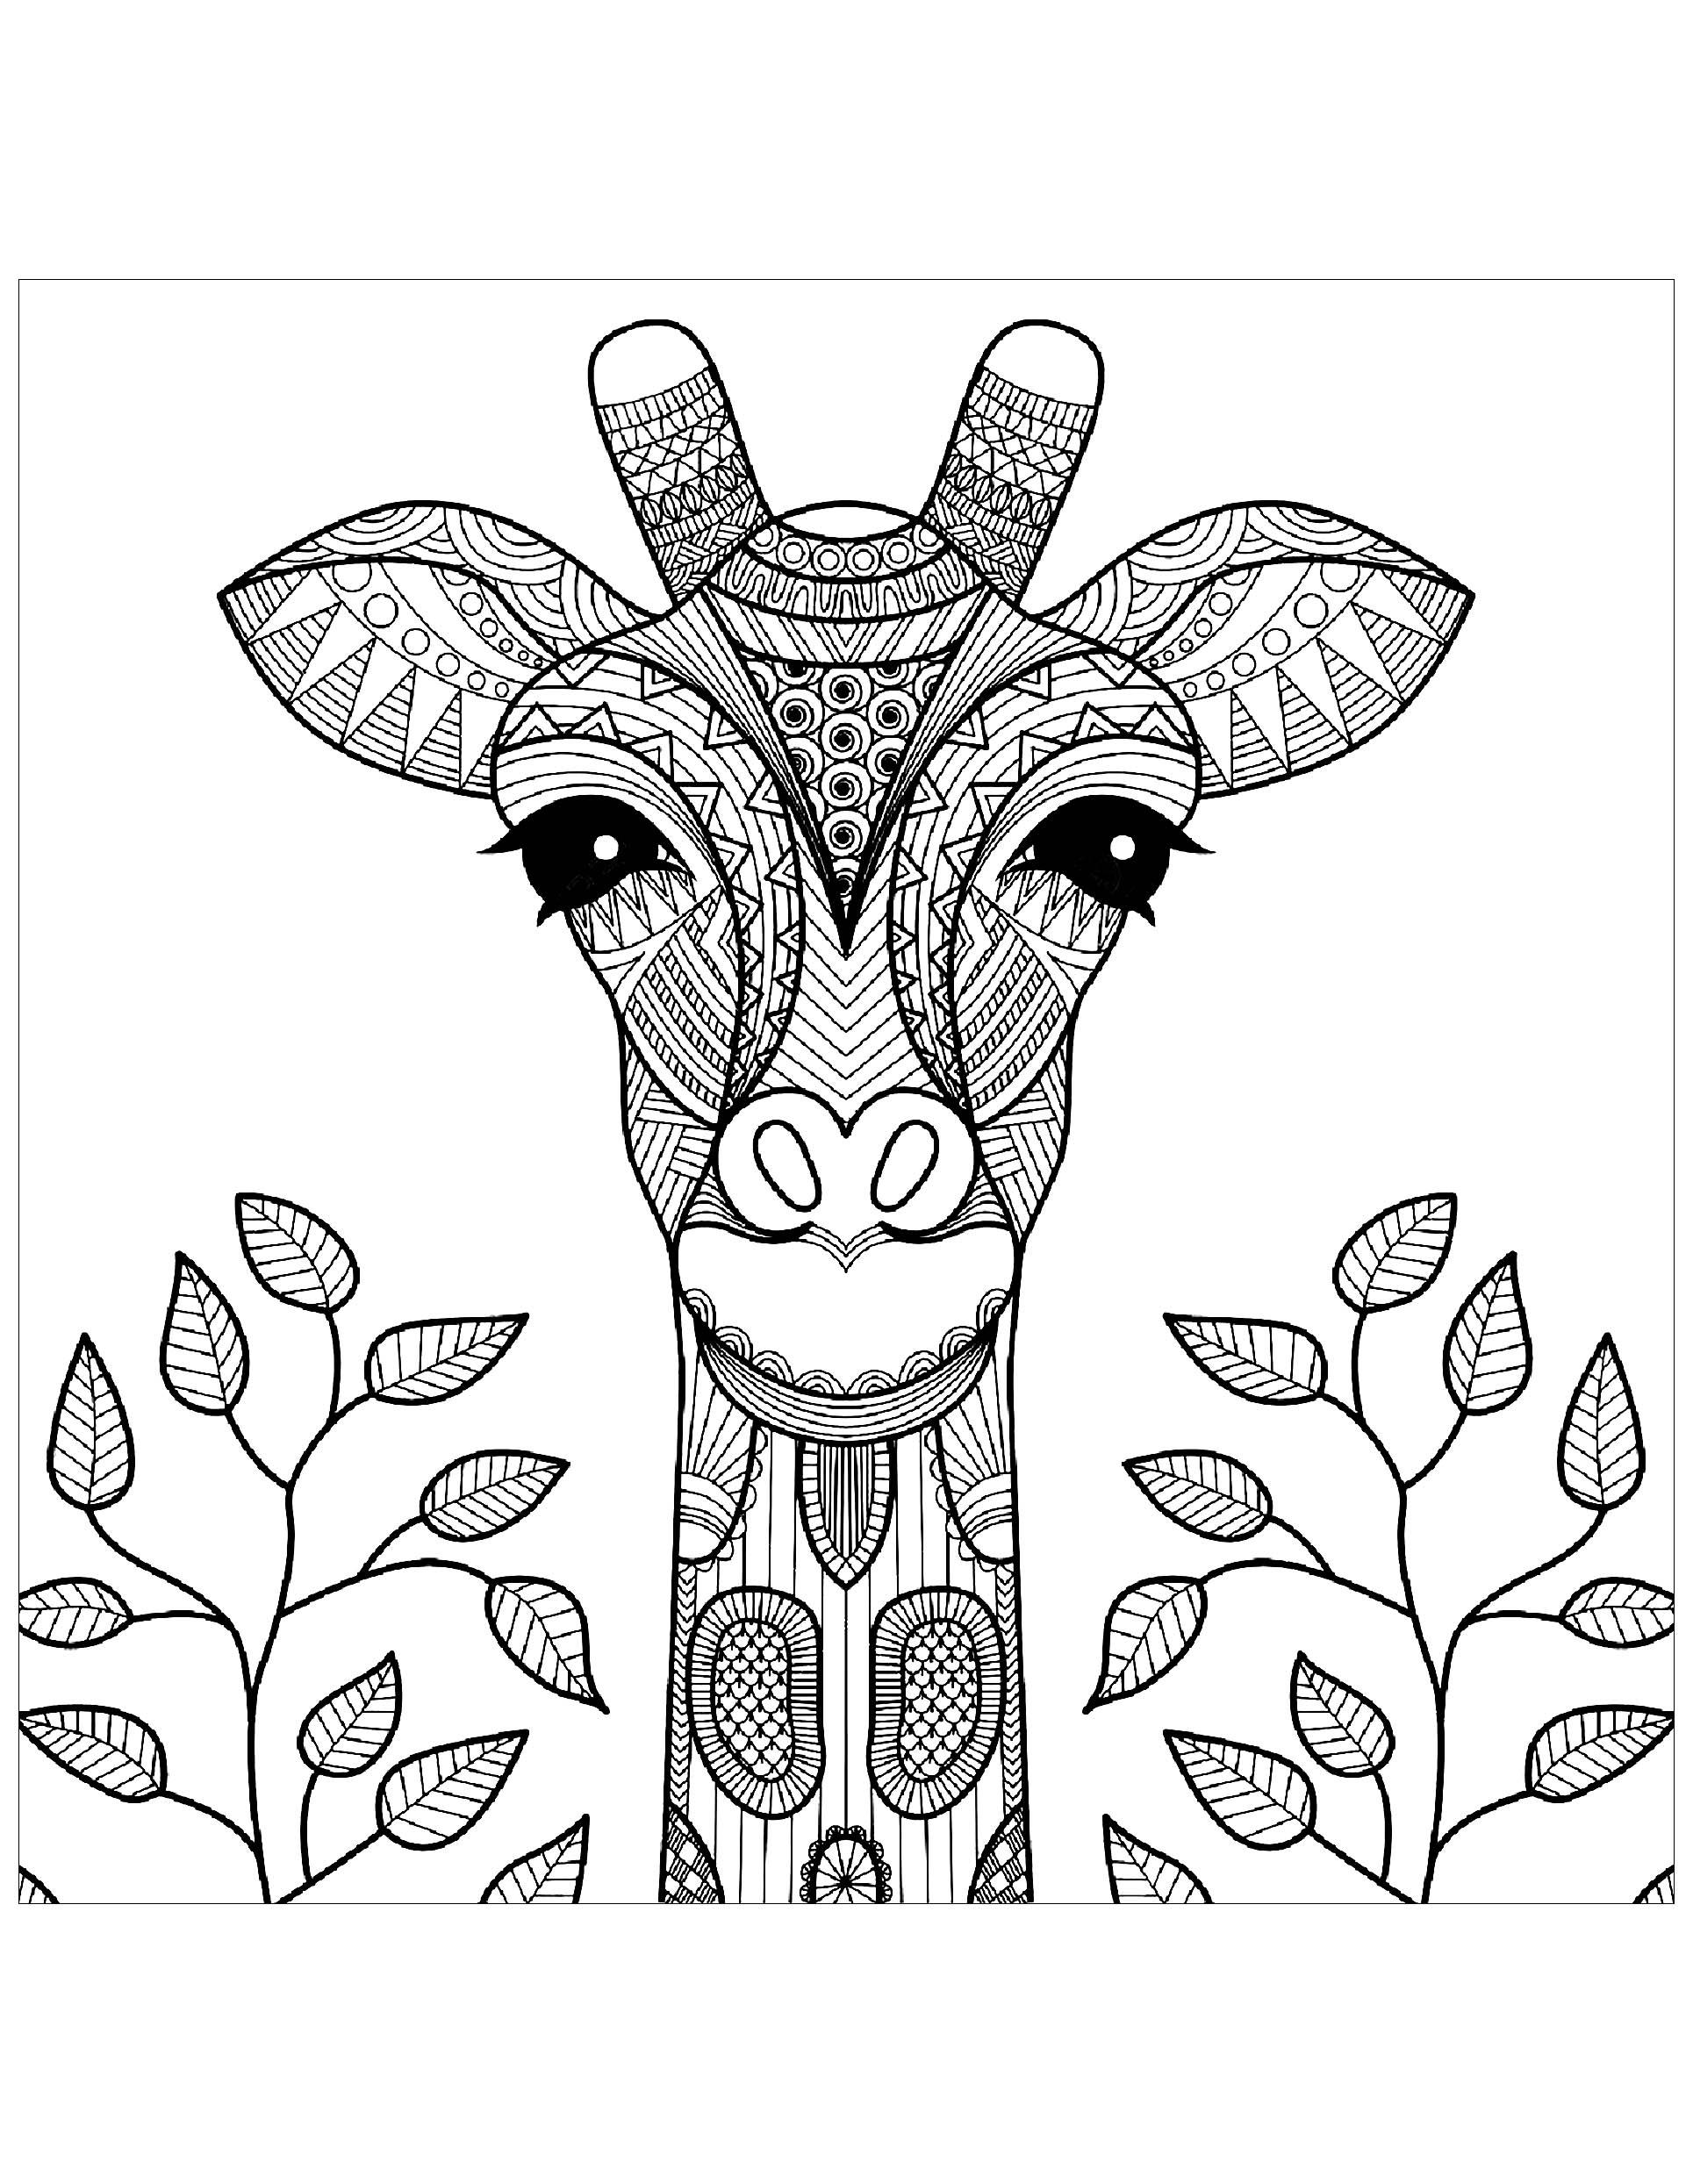 Giraffen 70659 - Giraffen - Malbuch Fur Erwachsene